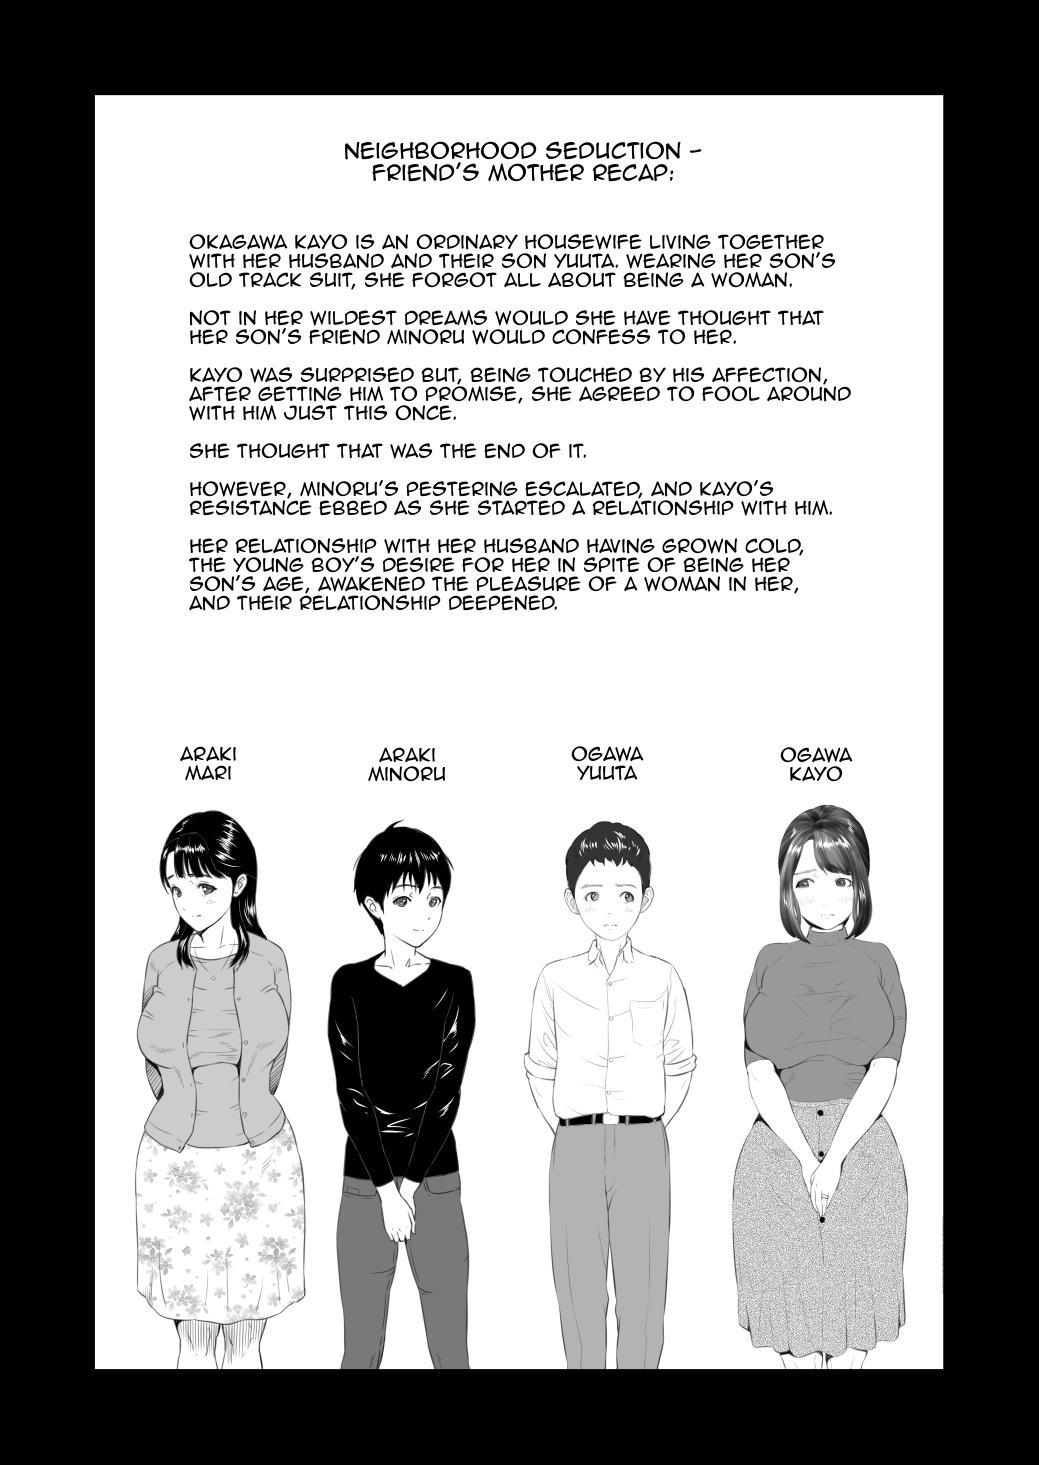 [Hyji] Kinjo Yuuwaku Daisandan -Tomodachi no Okaa-san Hen- Chuuhen | Seducing the Neighborhood Lady - Friend's Mother Middle part [English] [Amoskandy] 1